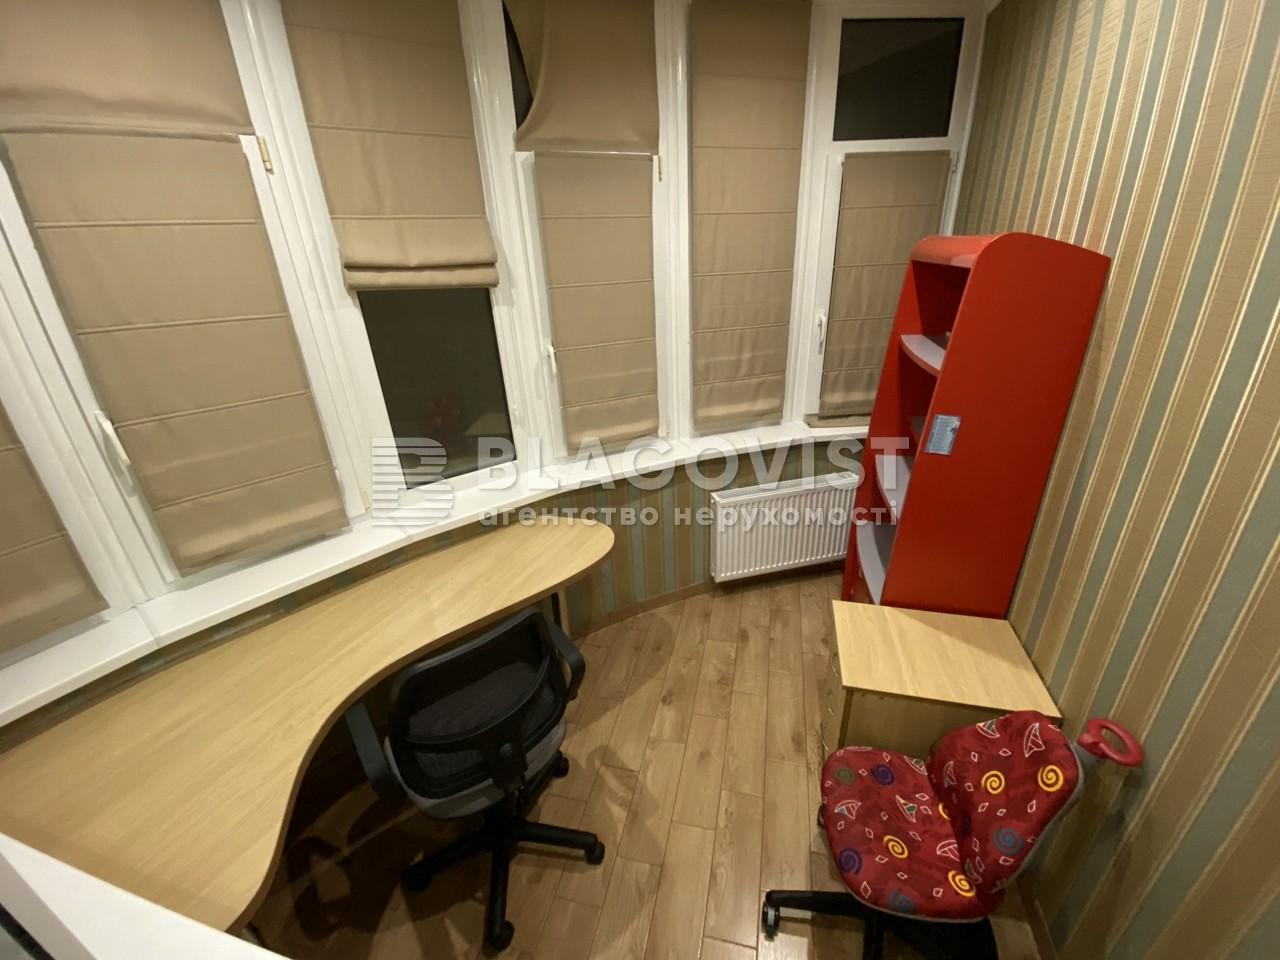 Квартира C-107159, Леси Украинки бульв., 7б, Киев - Фото 14